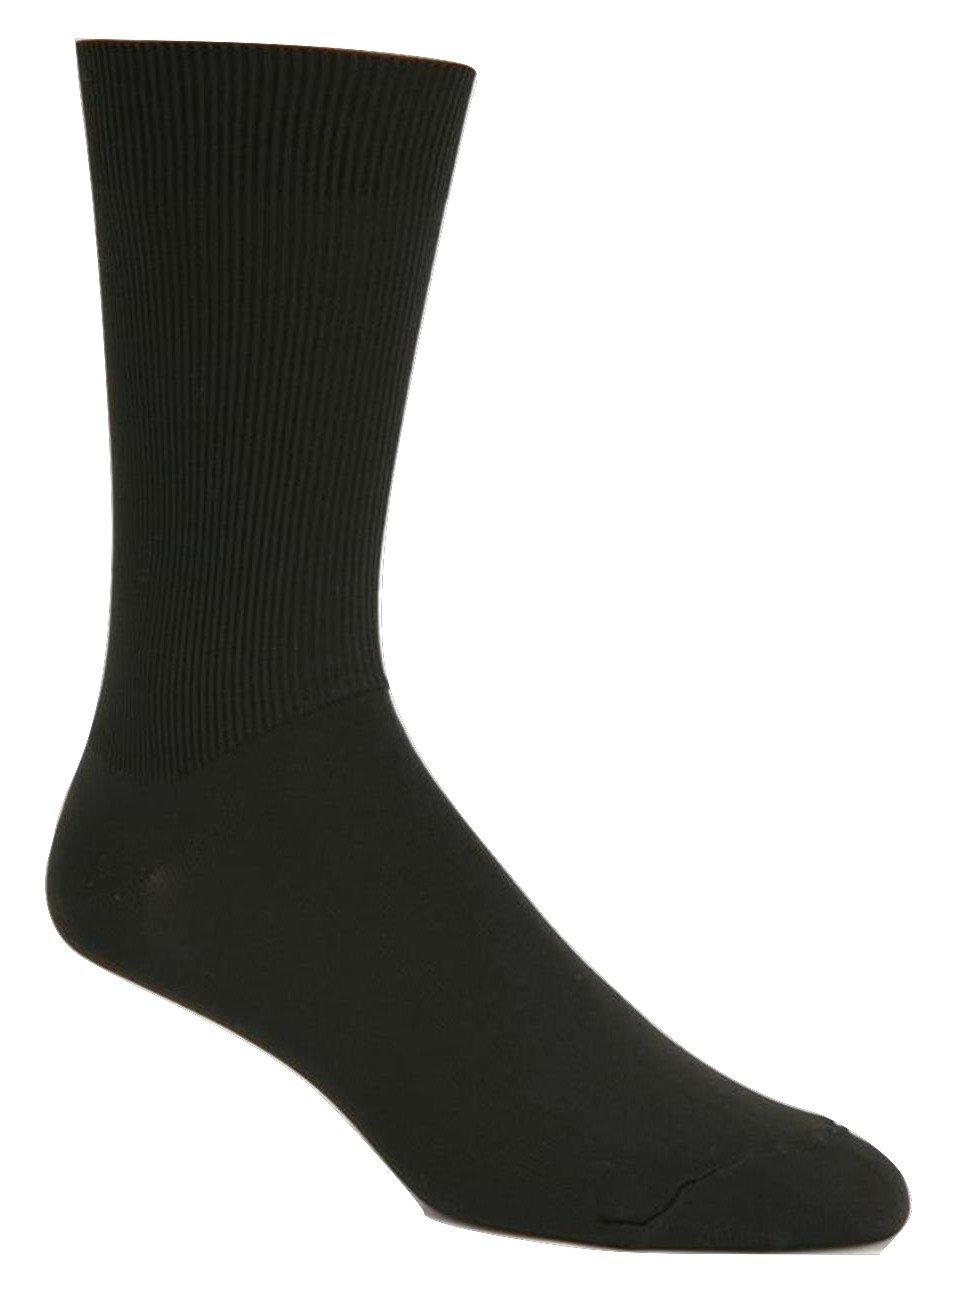 J.B. Field's Expedition Adventure Travel Quick Dry Socks (2 Pairs) (Medium (5-9 Shoe), White)